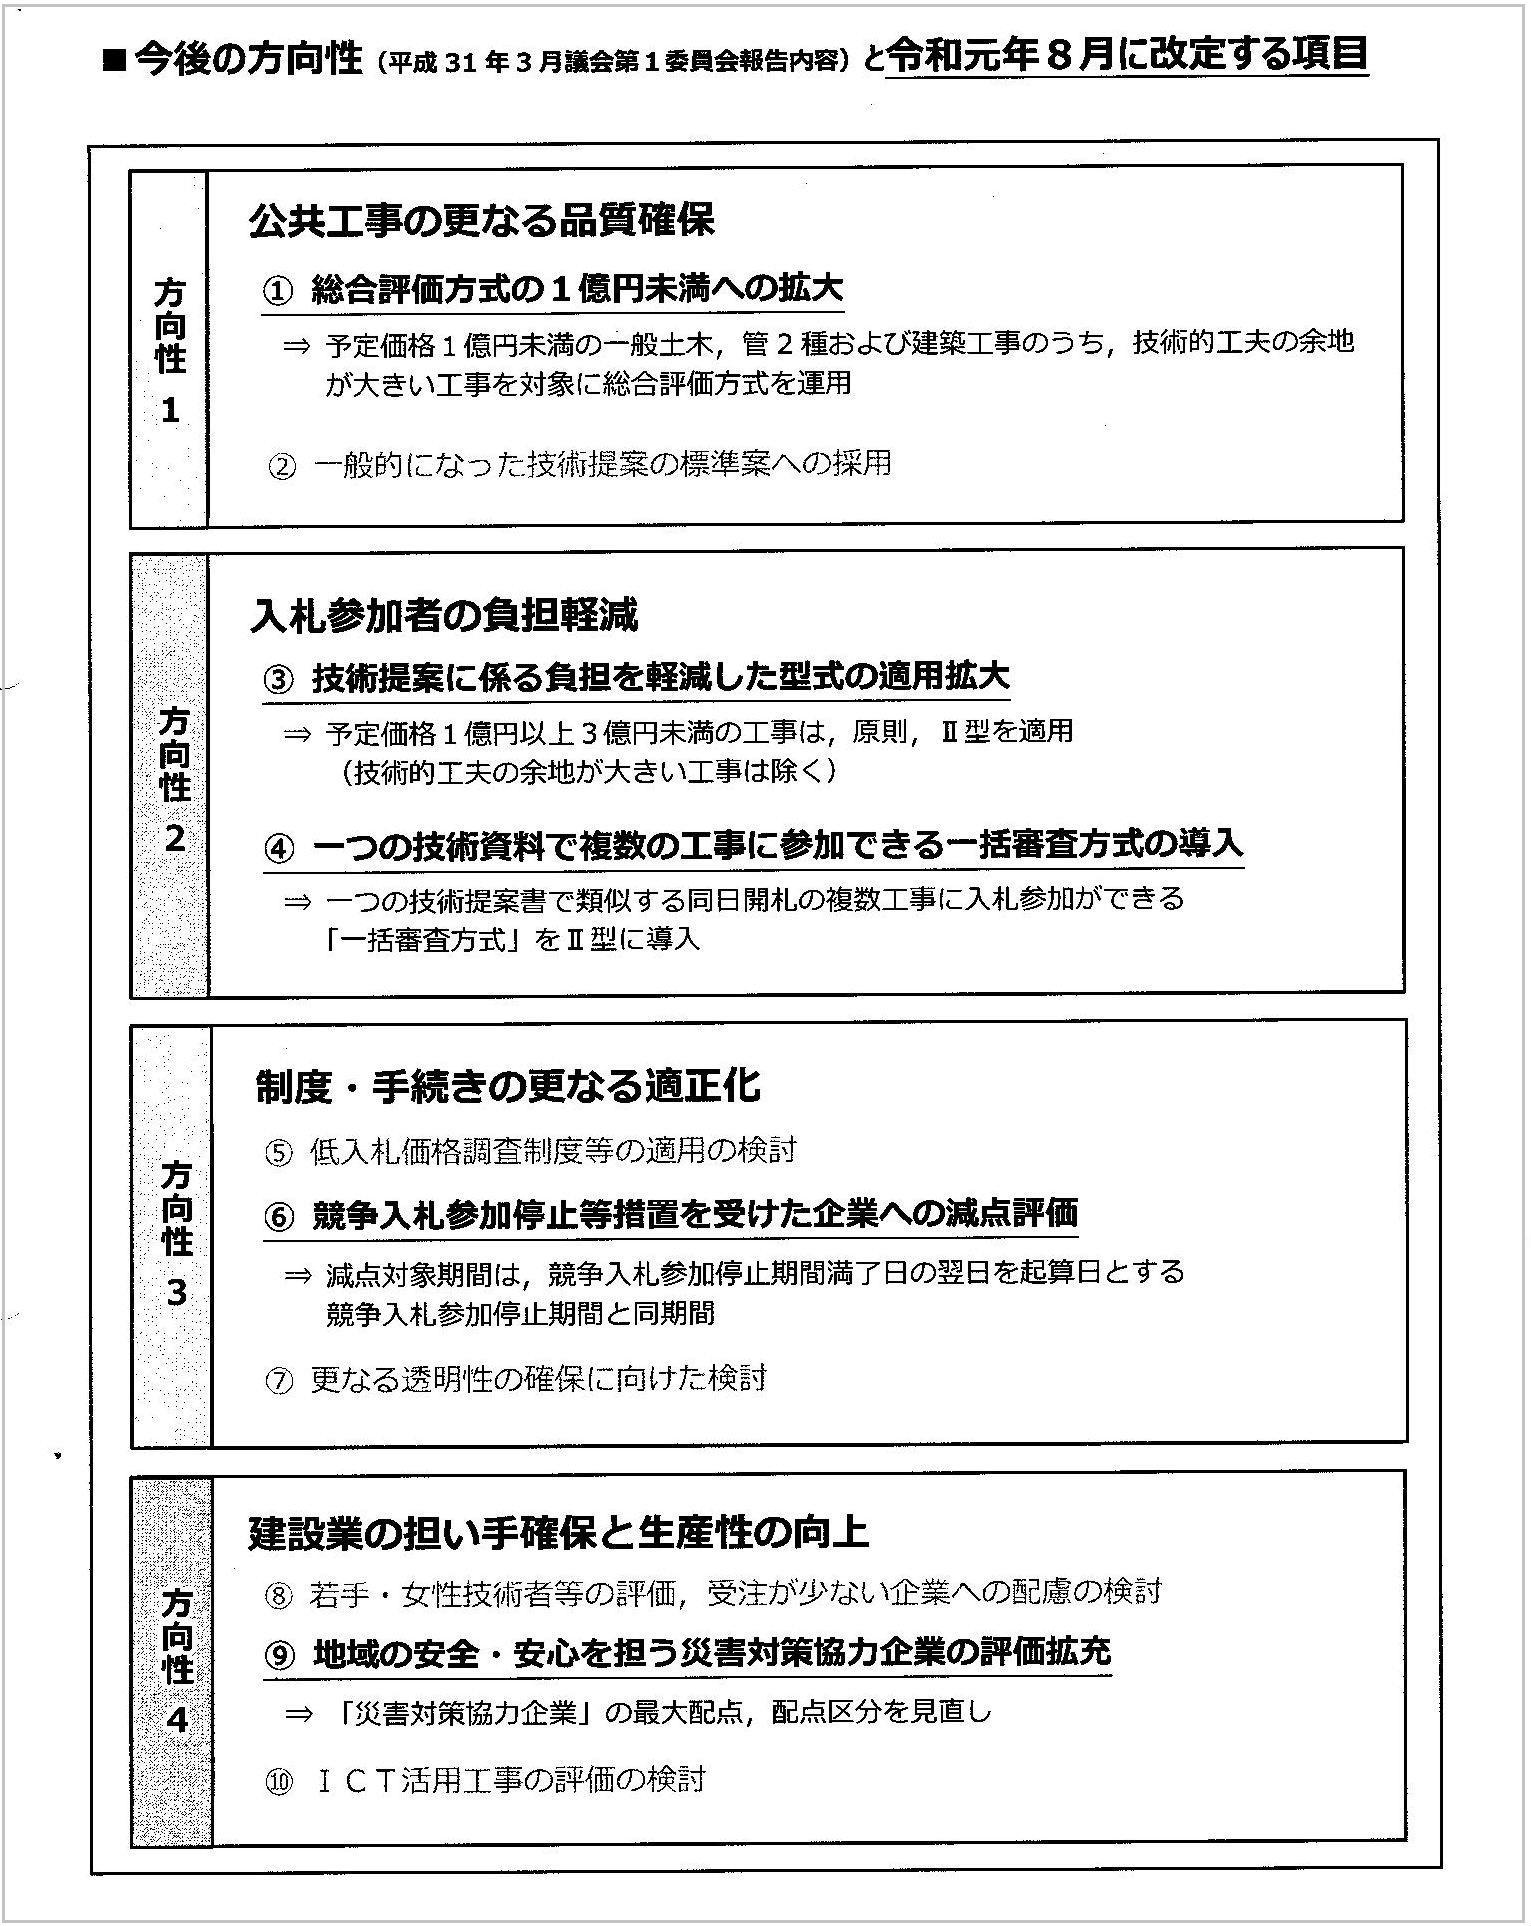 http://hunter-investigate.jp/news/92c6616507a6e81e250e700444c221a799b95f7b.jpg